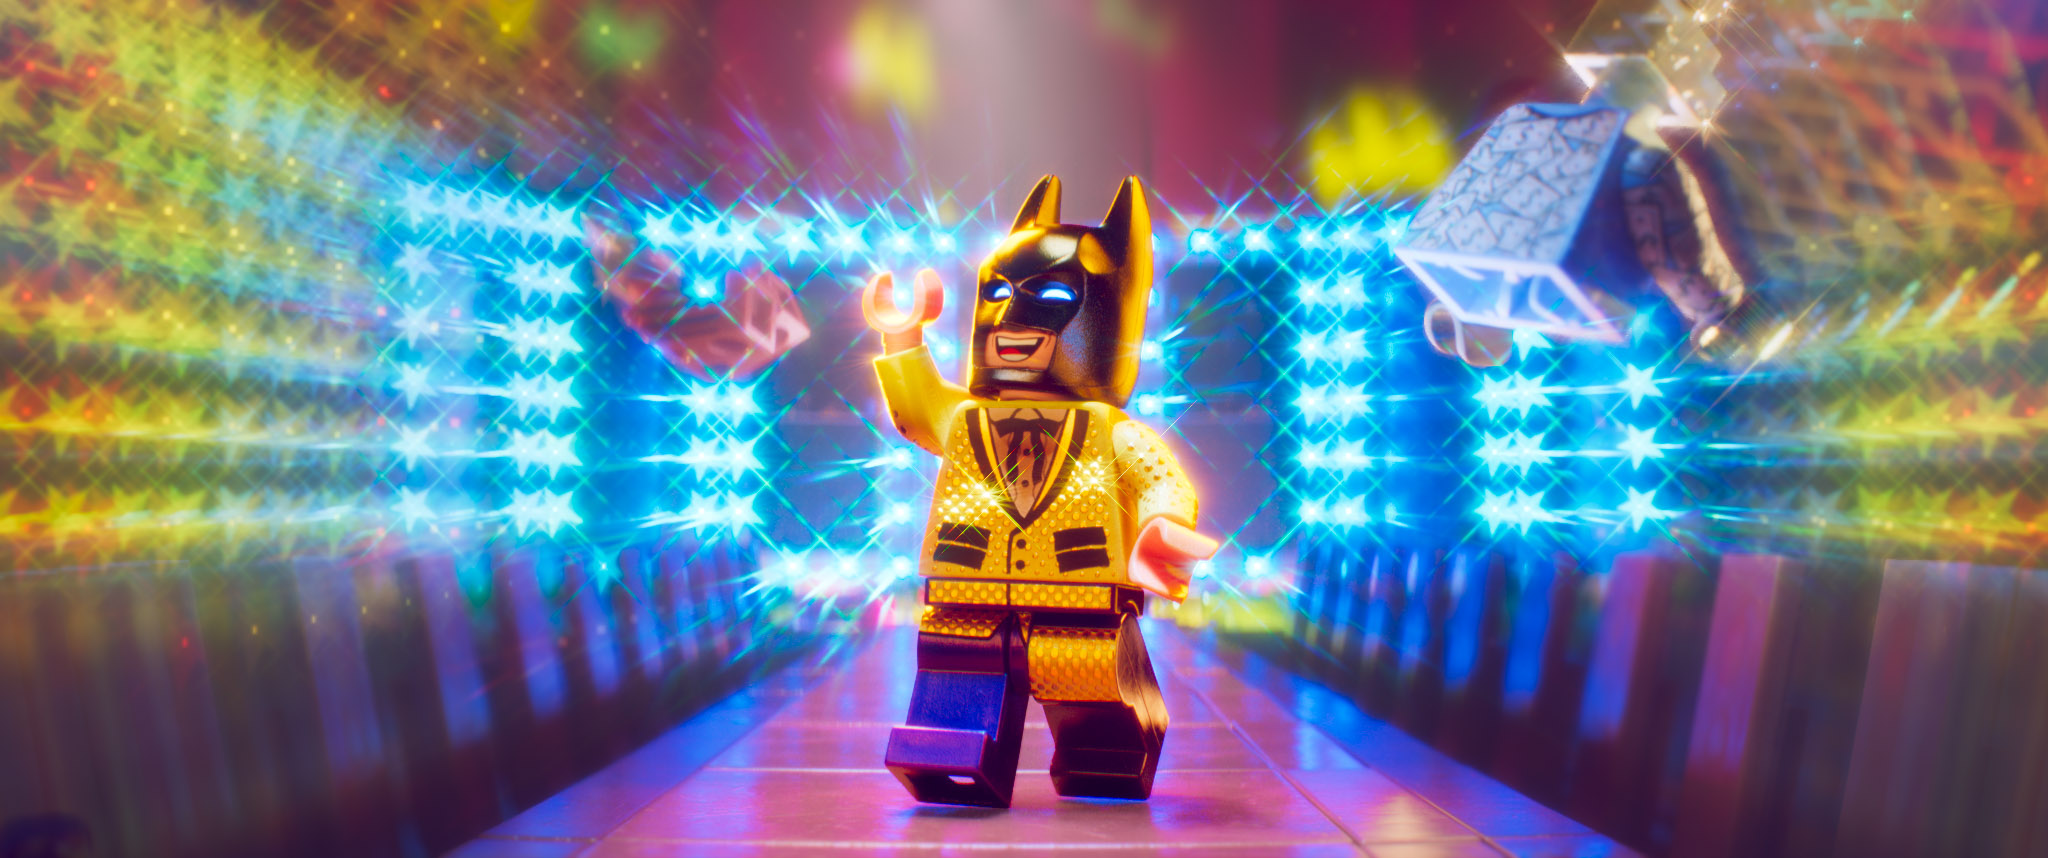 Image result for the lego batman movie matrix